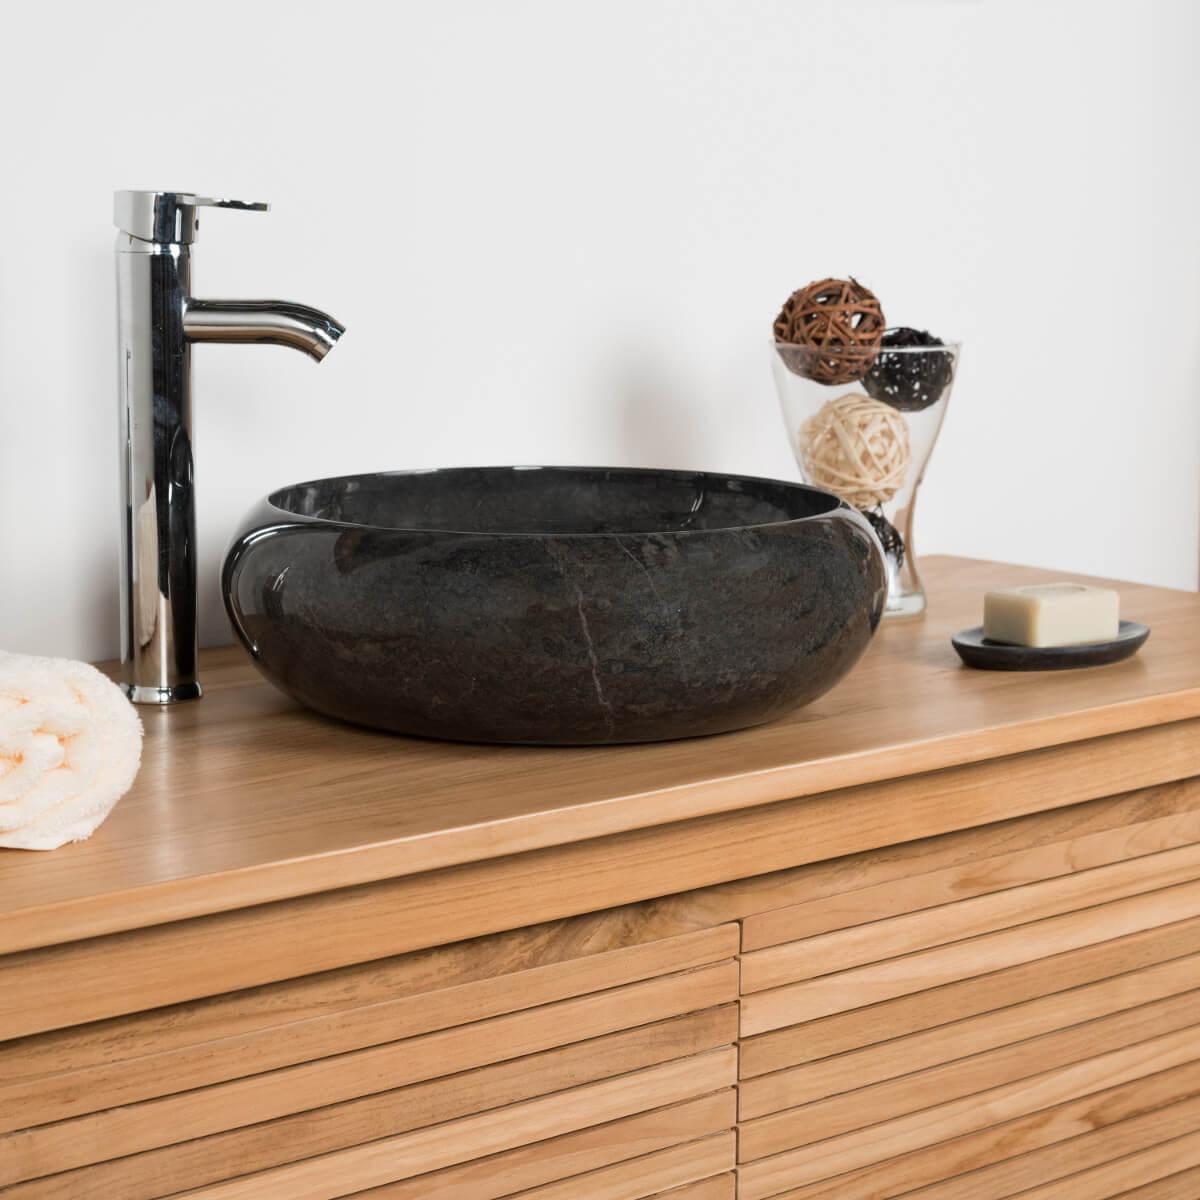 vasque noire salle de bain